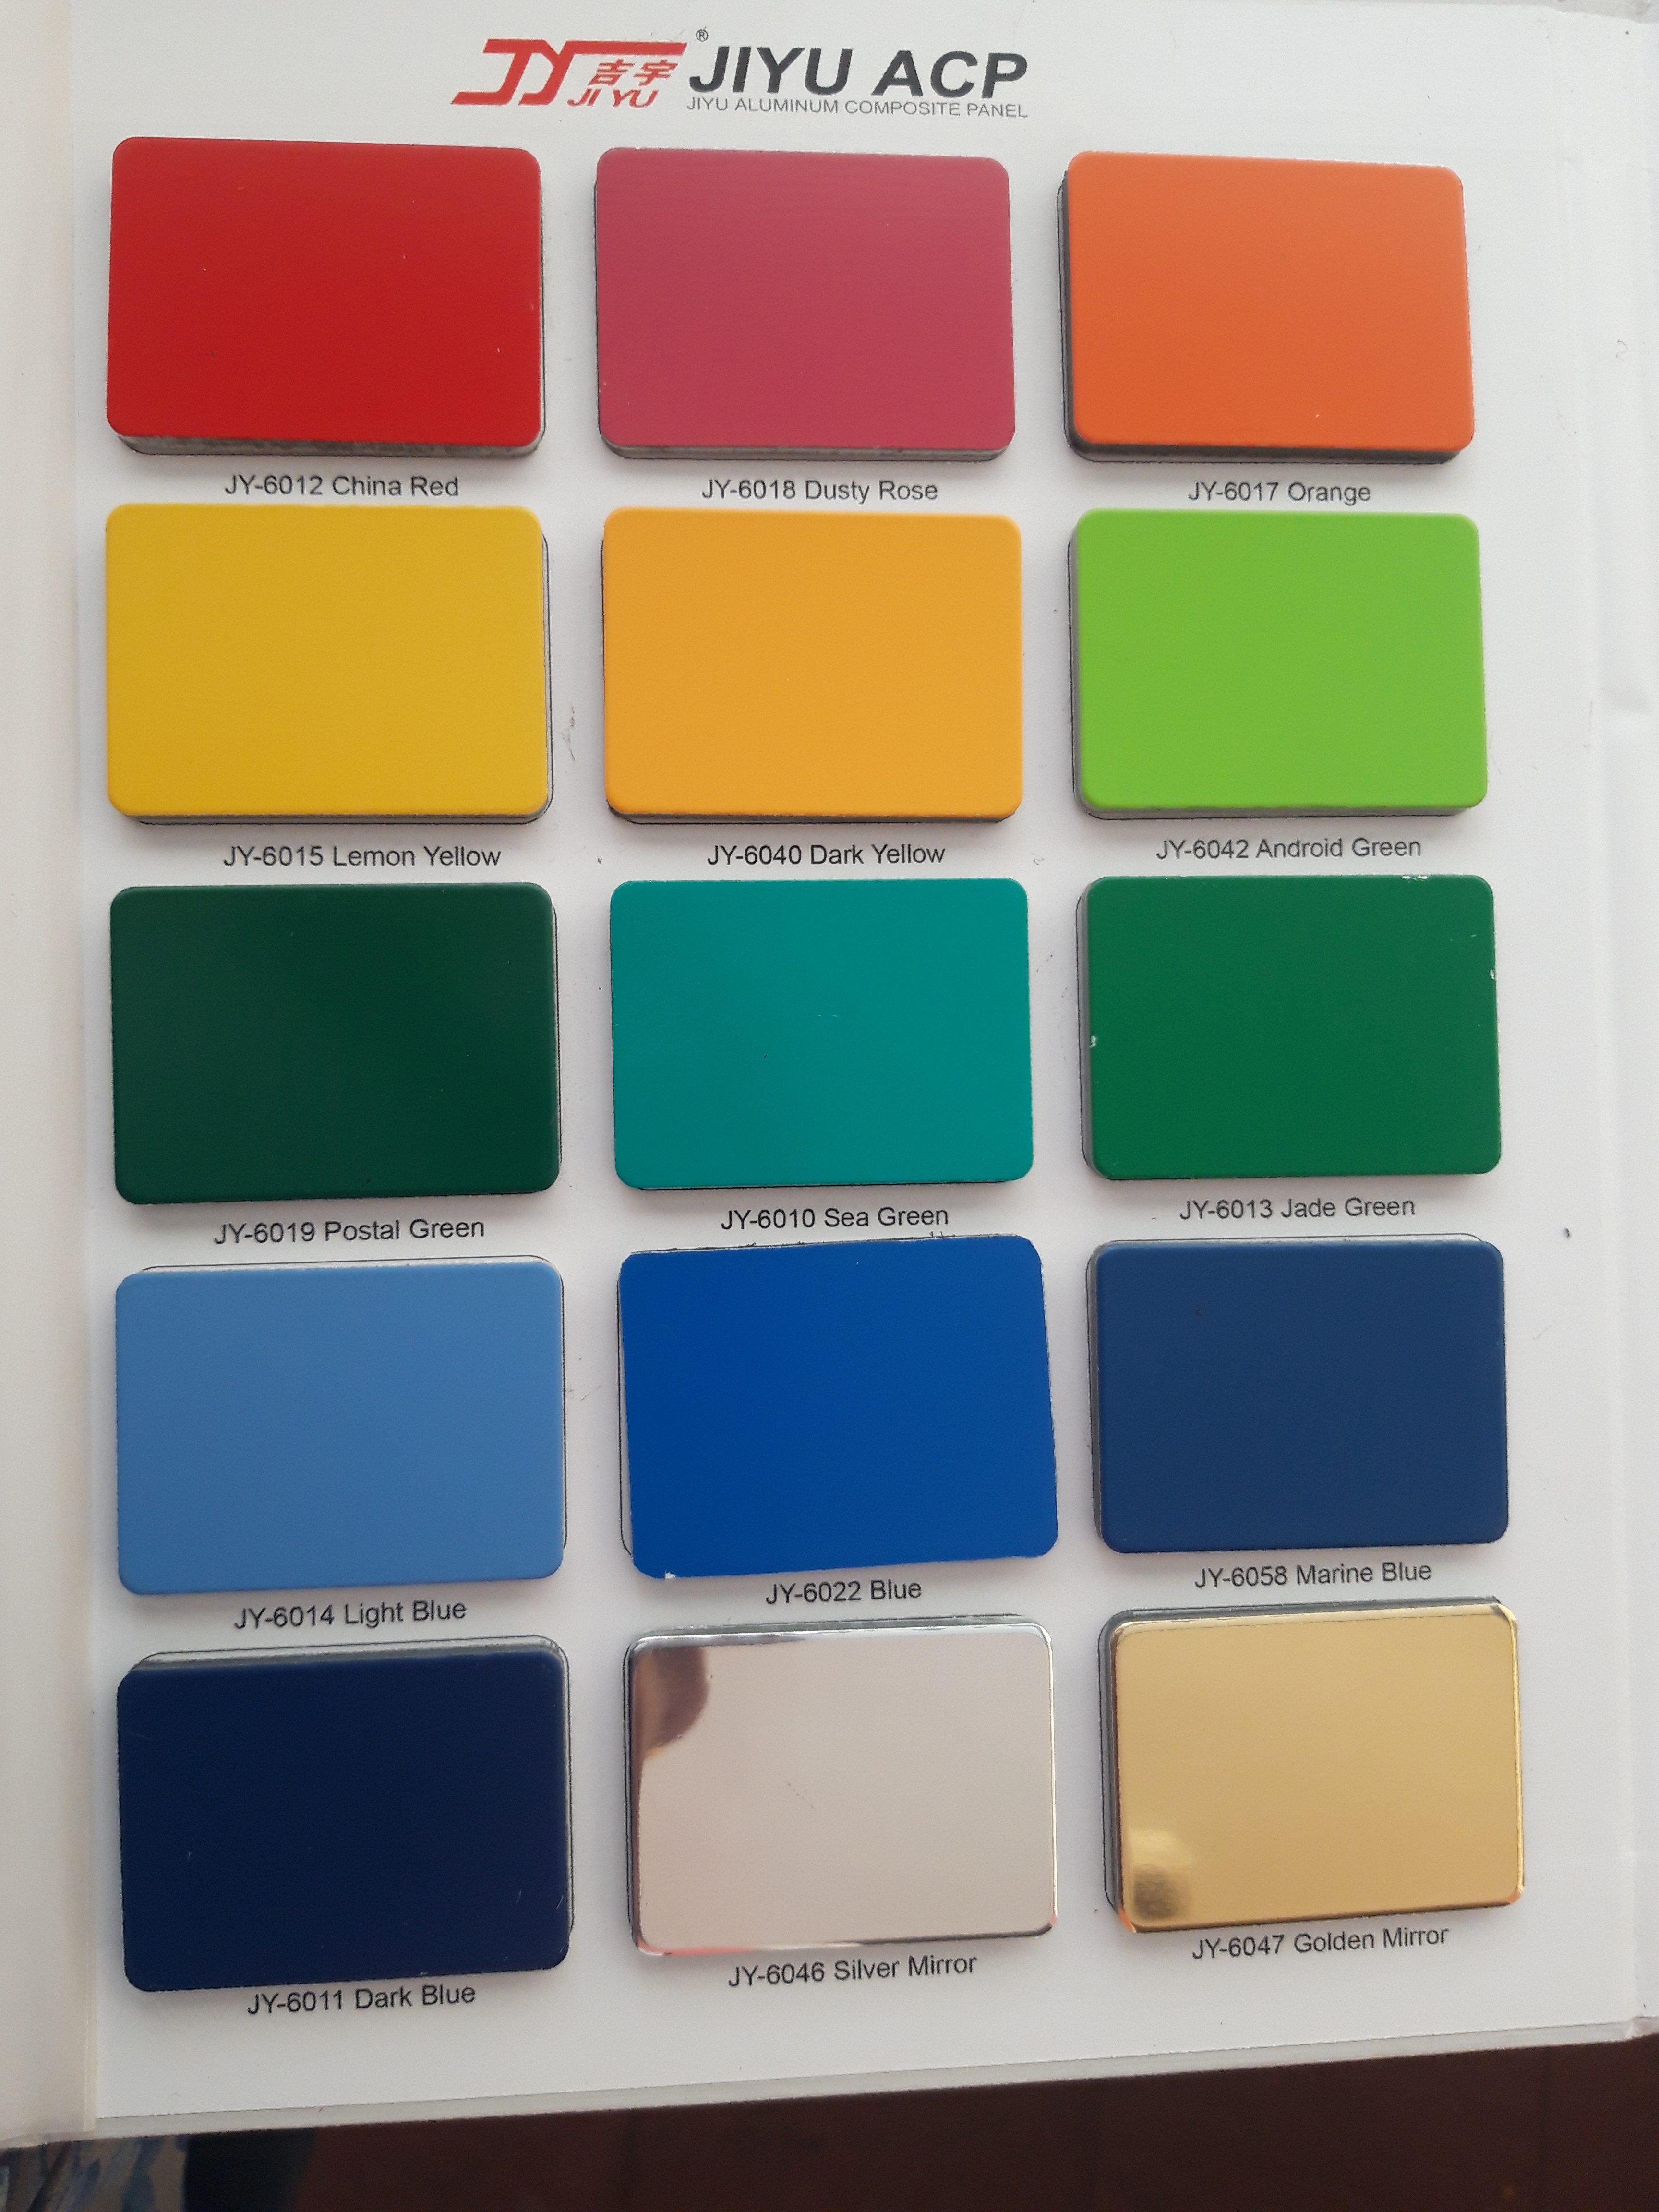 PE/Polyester 0,21 JIYU 4mm Alumunium Composite Panel